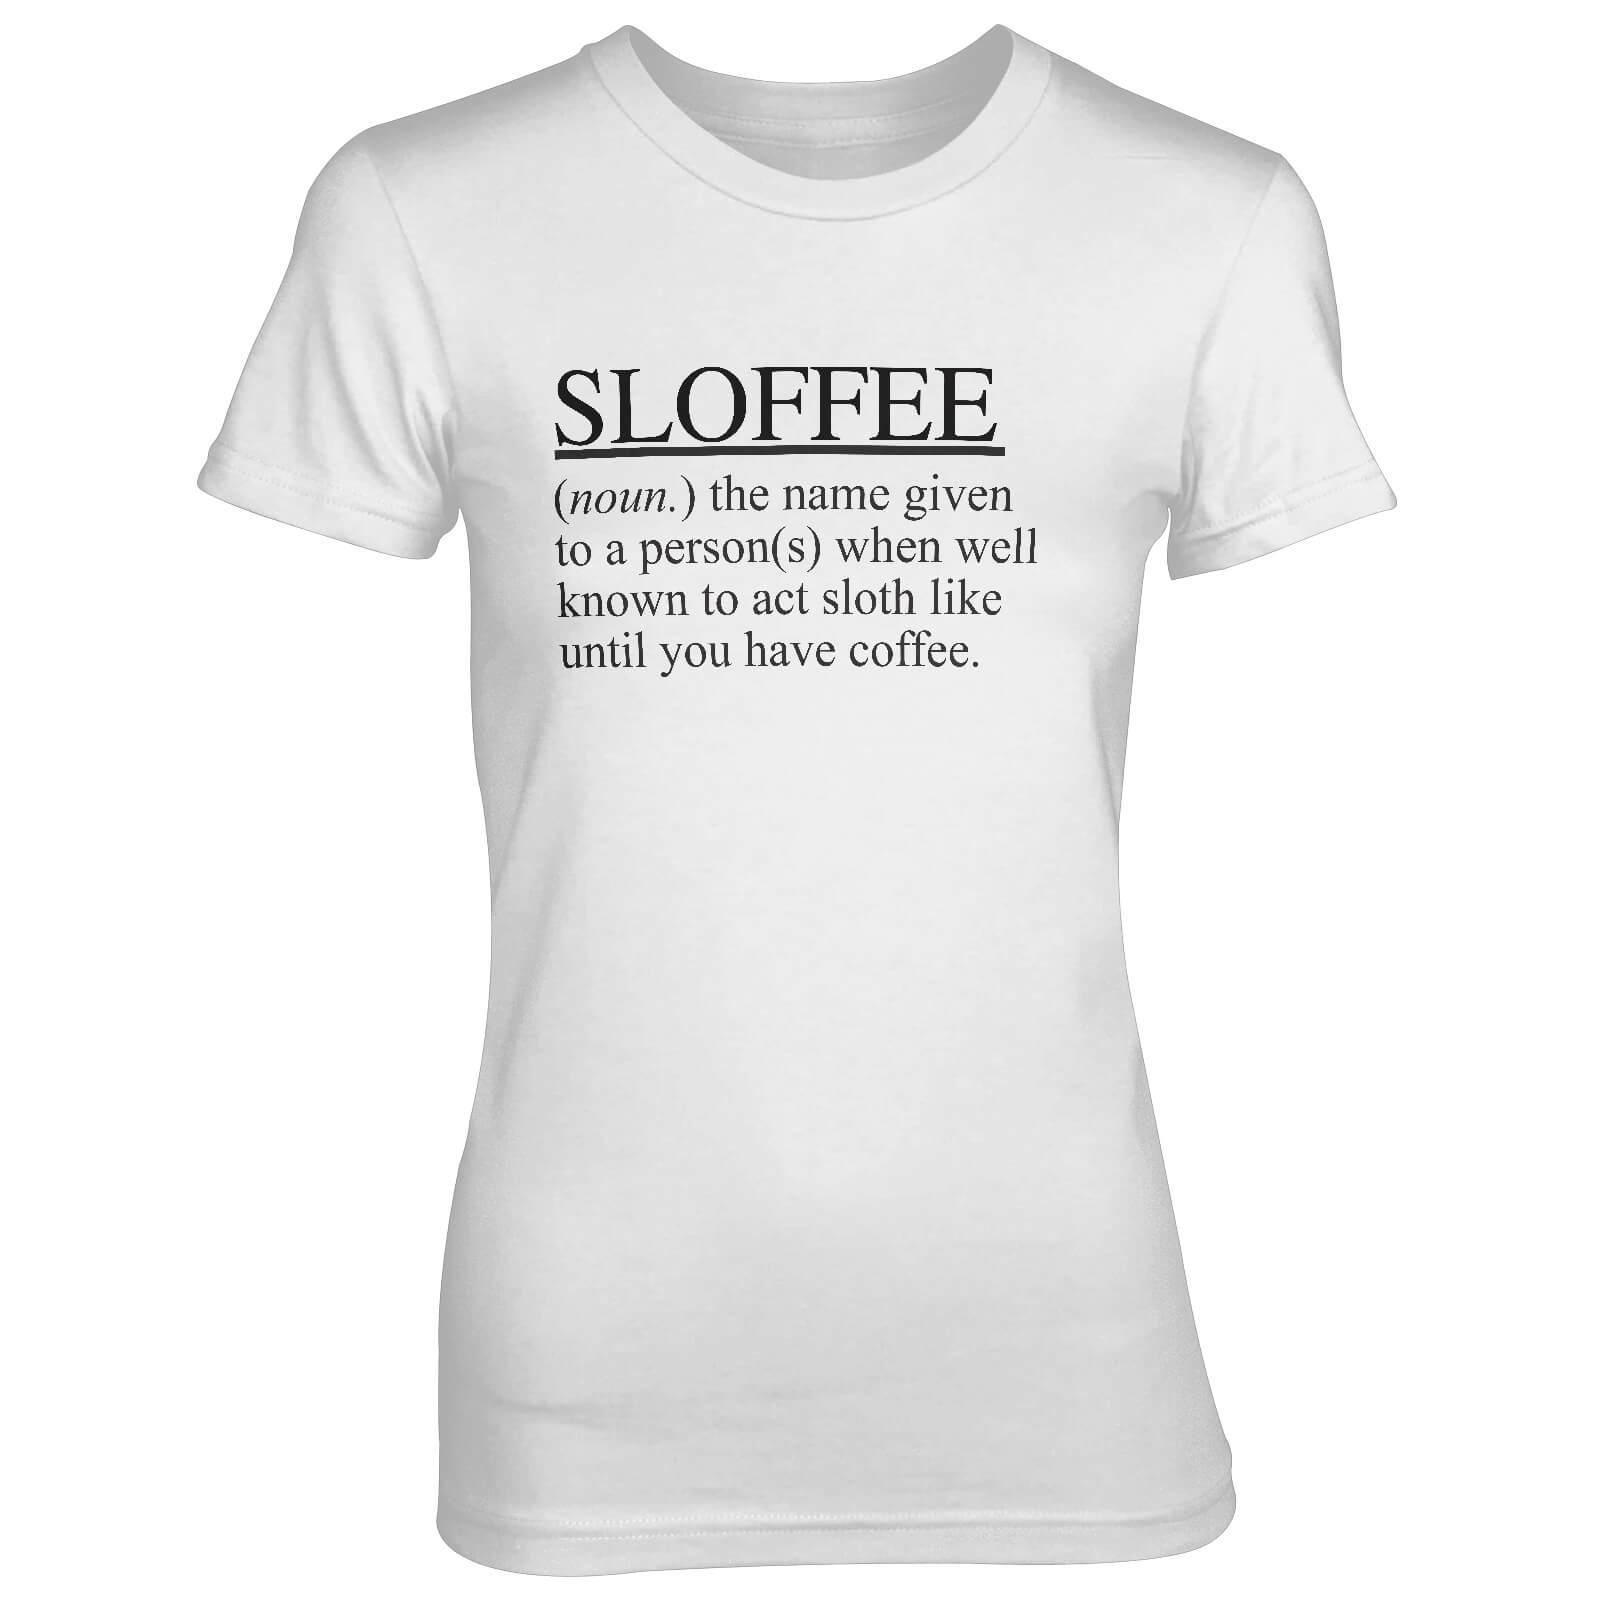 T-Junkie Sloffee Women's White T-Shirt - S - White